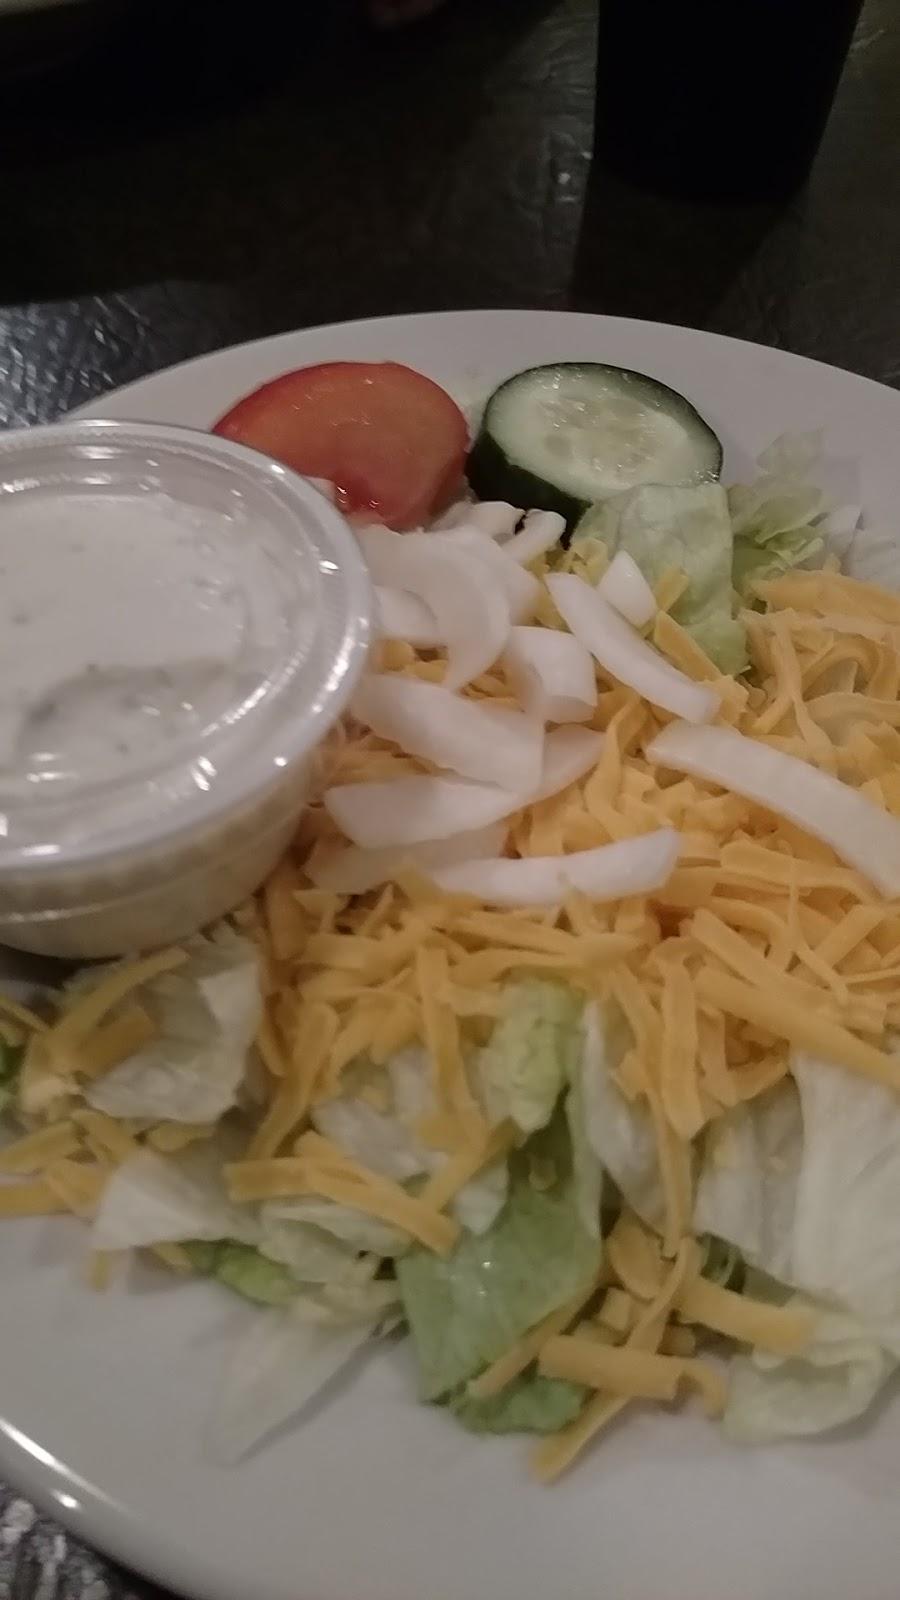 J Bs Steakhouse | restaurant | 109 S Folger St, Carrollton, MO 64633, USA | 6605421791 OR +1 660-542-1791